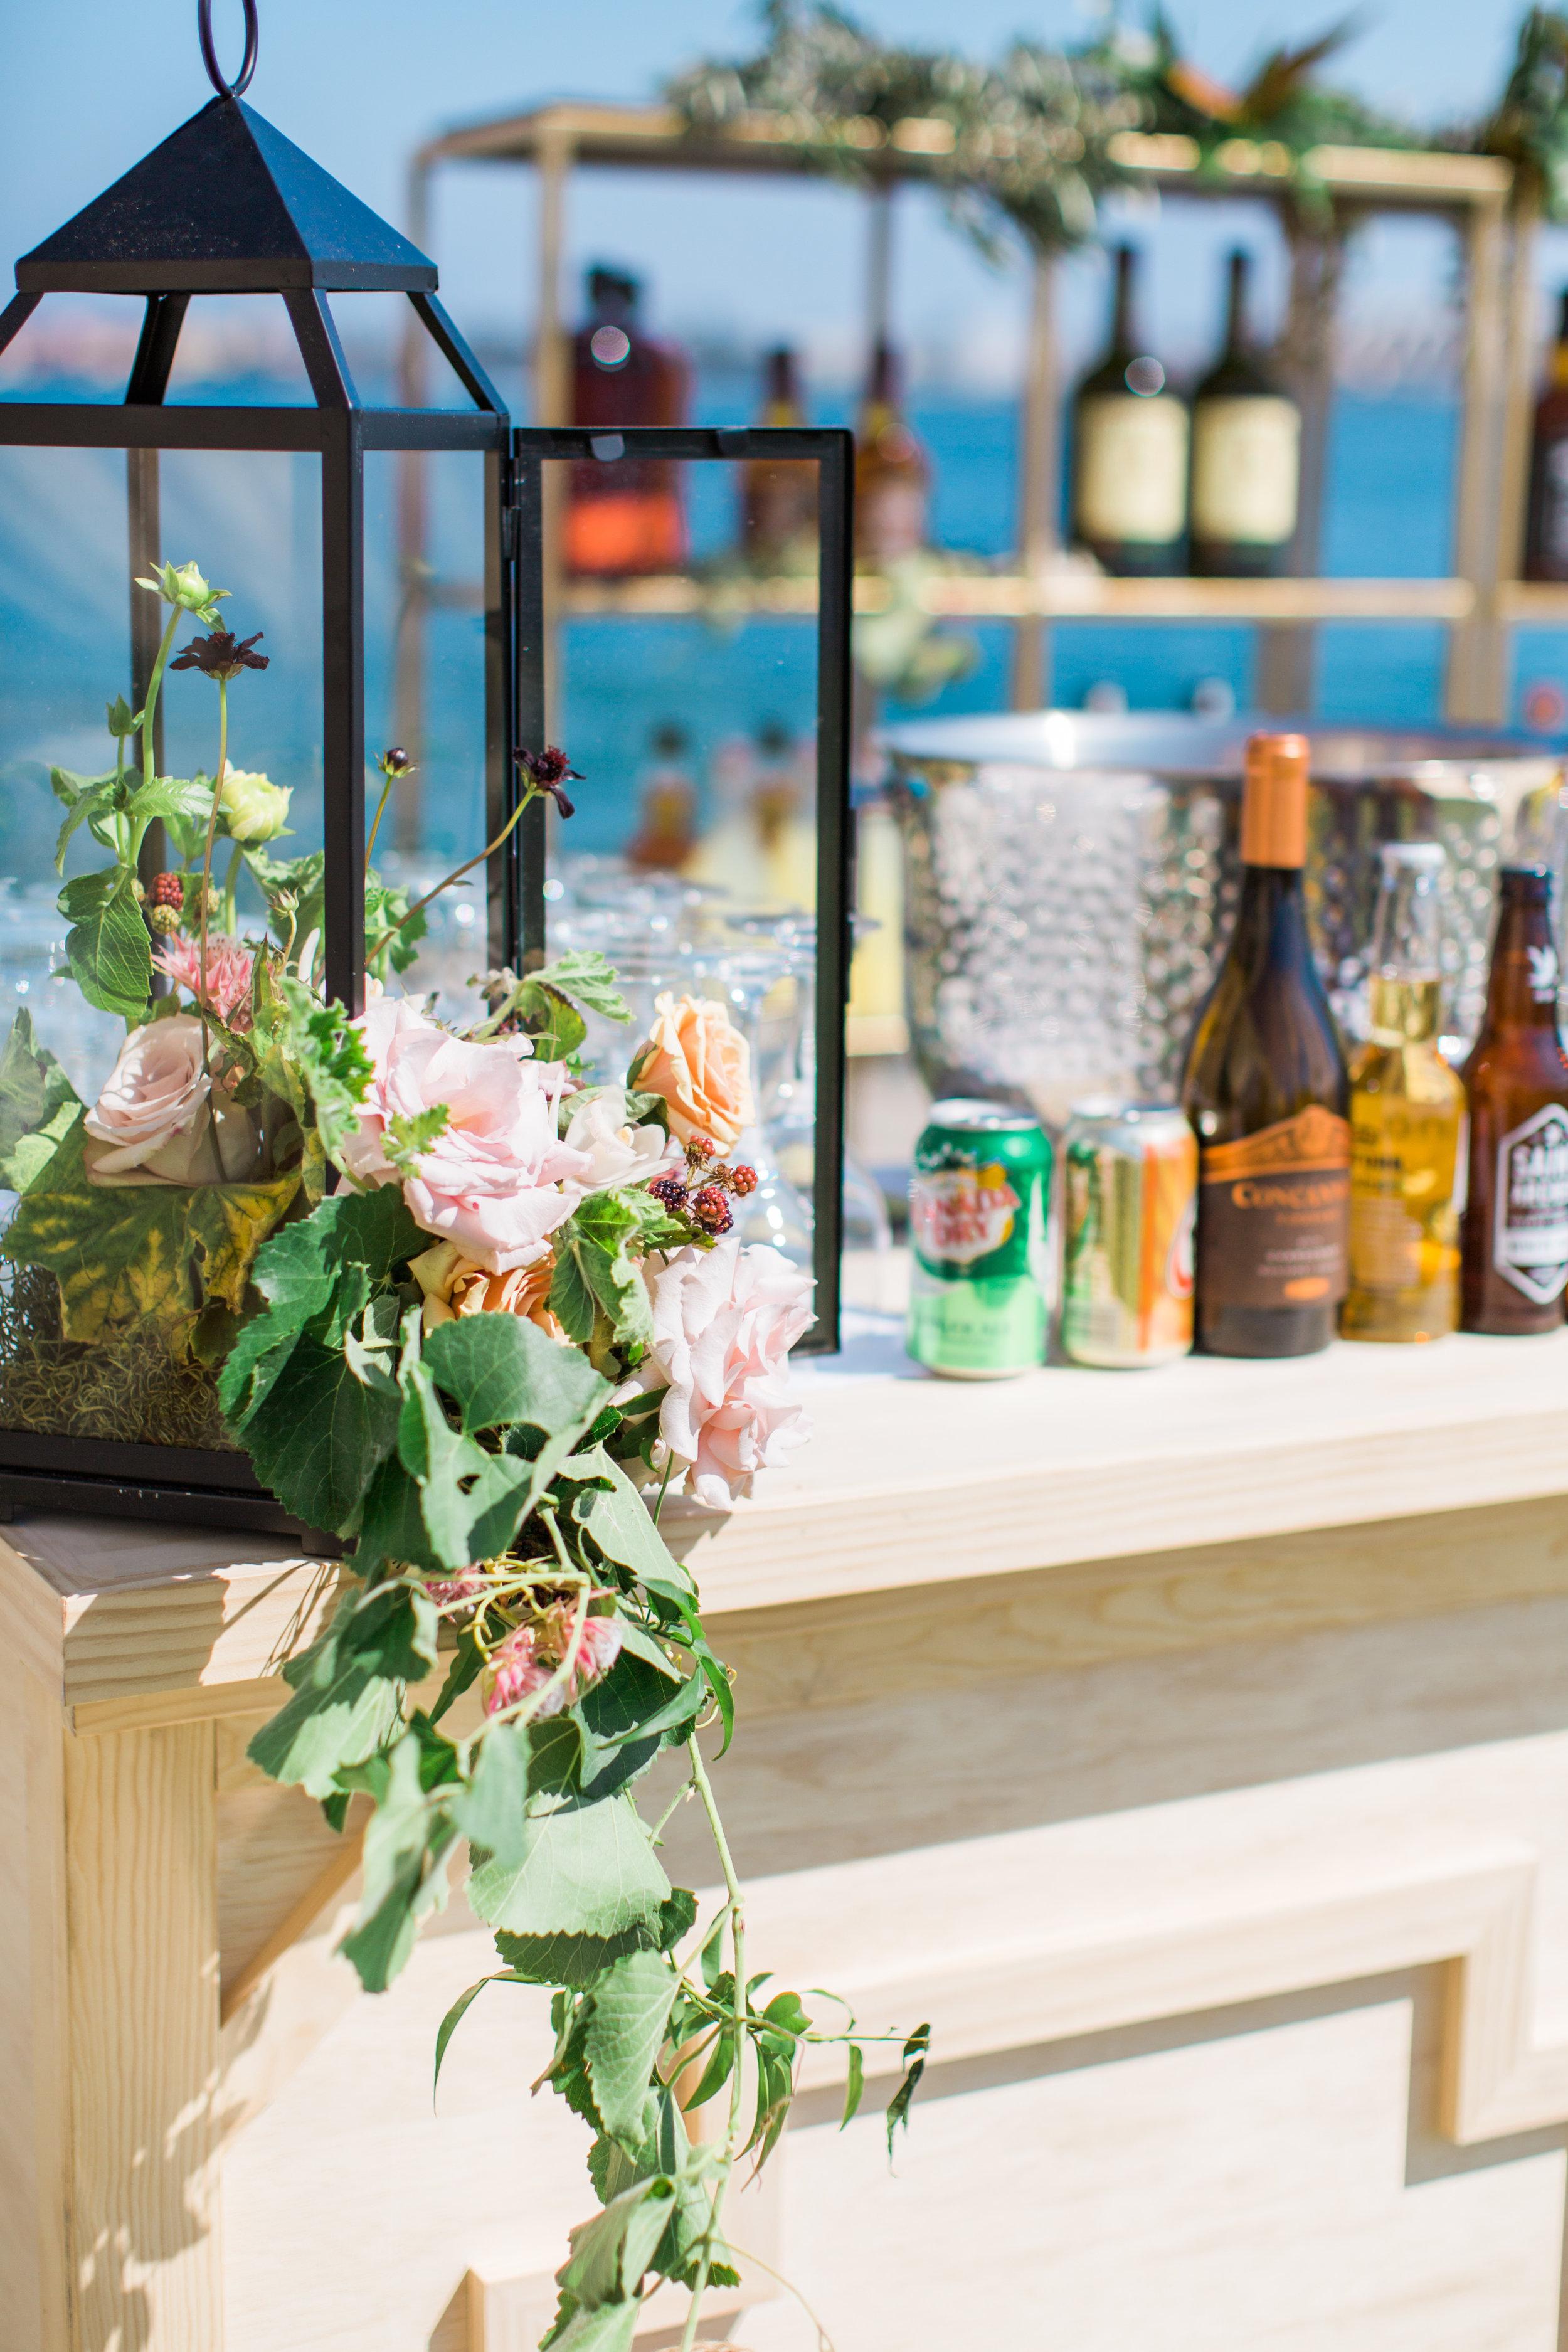 Blooms-breesa-lee-luxury-florist-aga-jones-tres-chic-affairs-san-diego-wedding-classic-coast-catering-(24).jpg